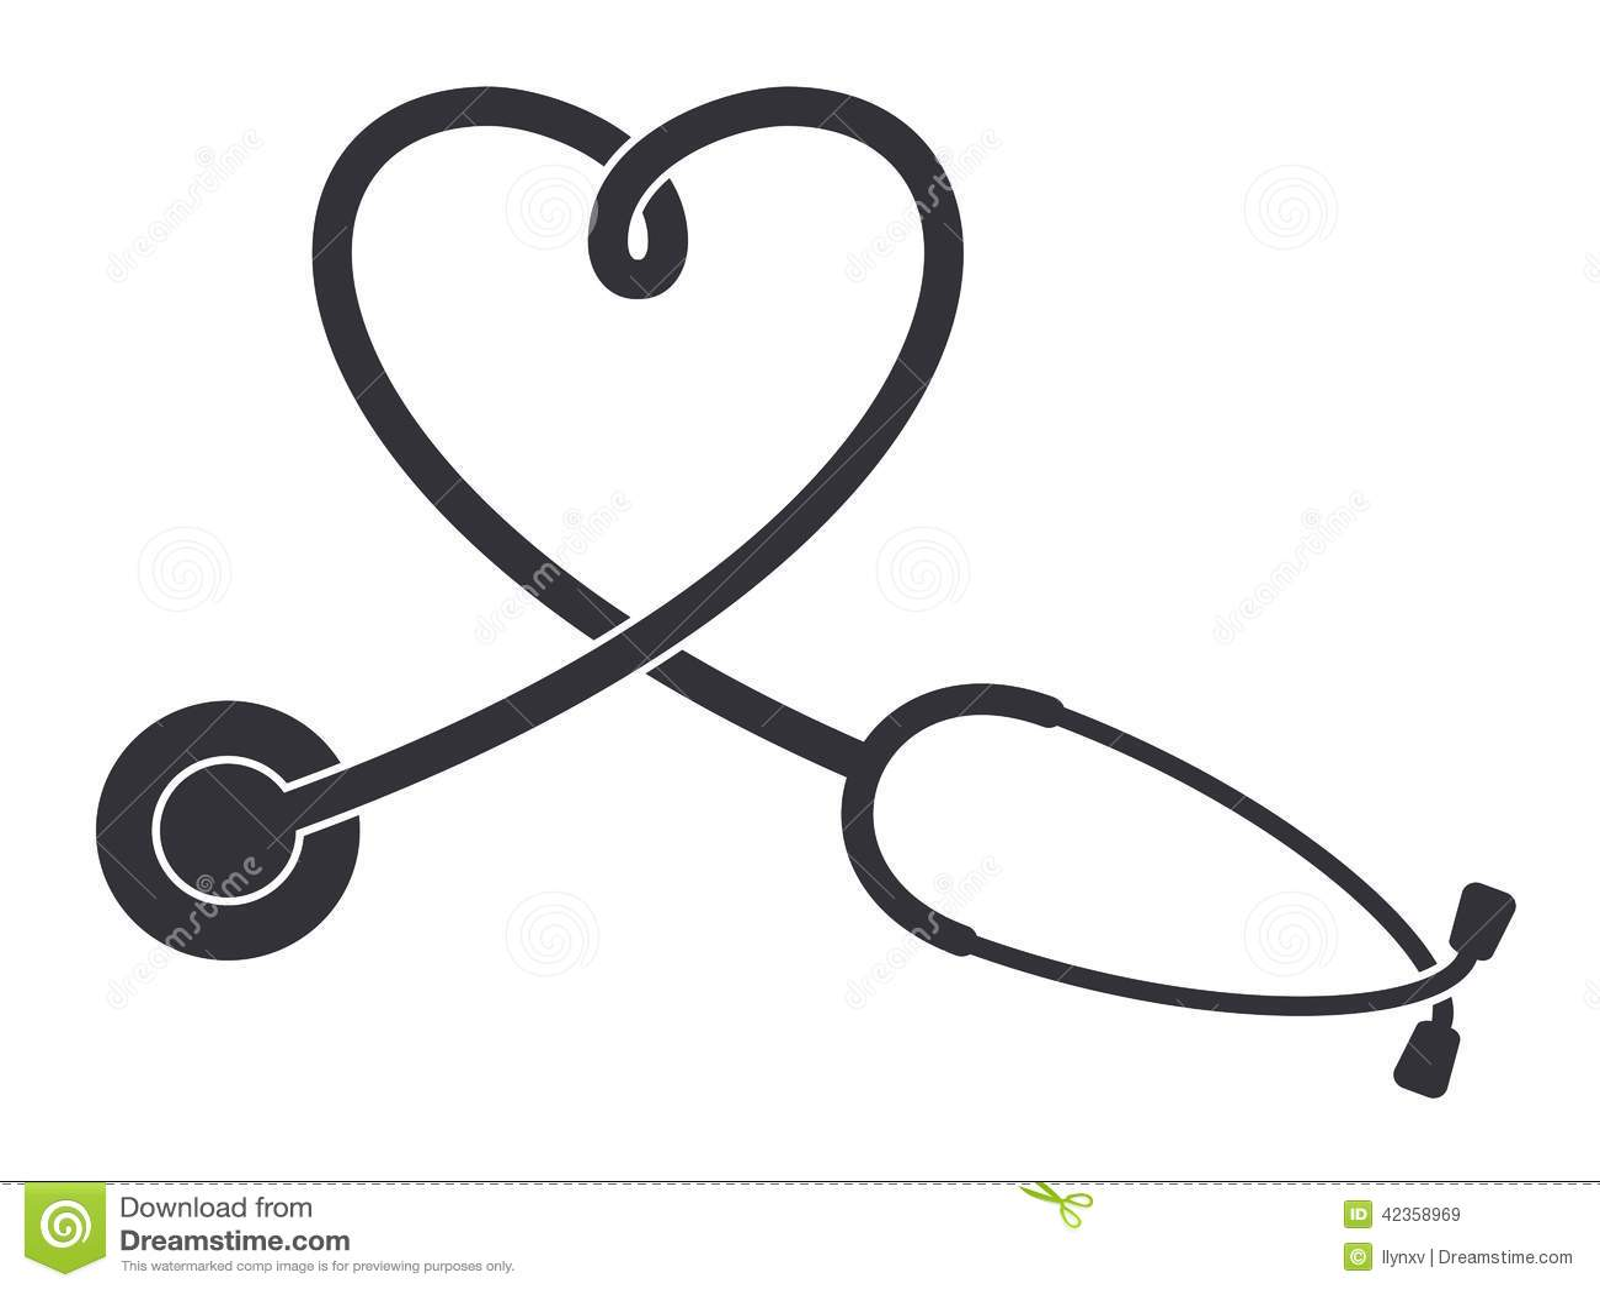 Stethoscope icon stock vector. Illustration of care, disease - 42358969 for Stethoscope Illustration Png  76uhy